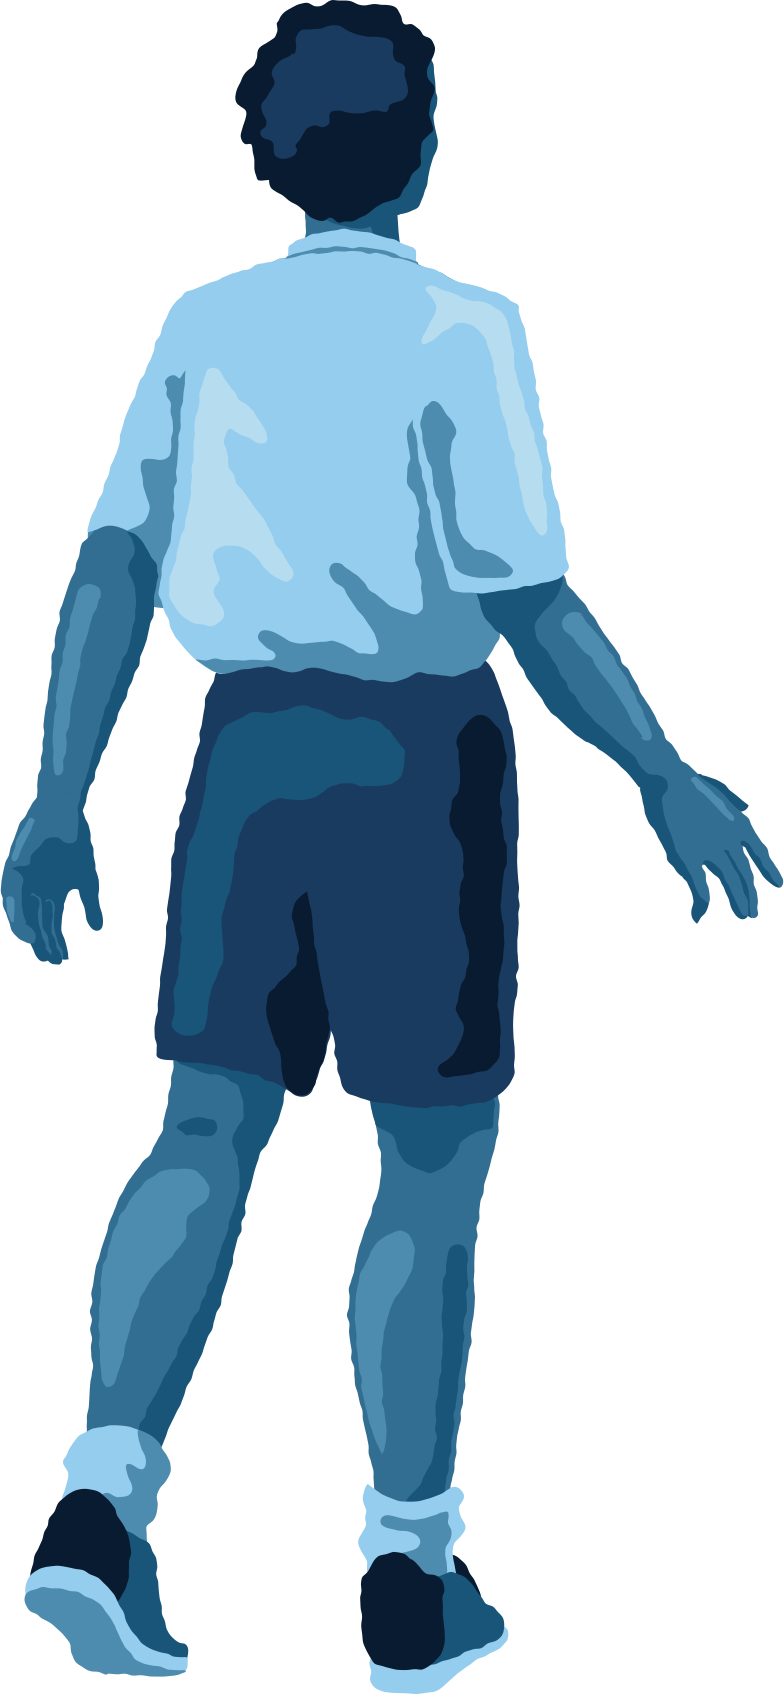 man standing back Clipart illustration in PNG, SVG